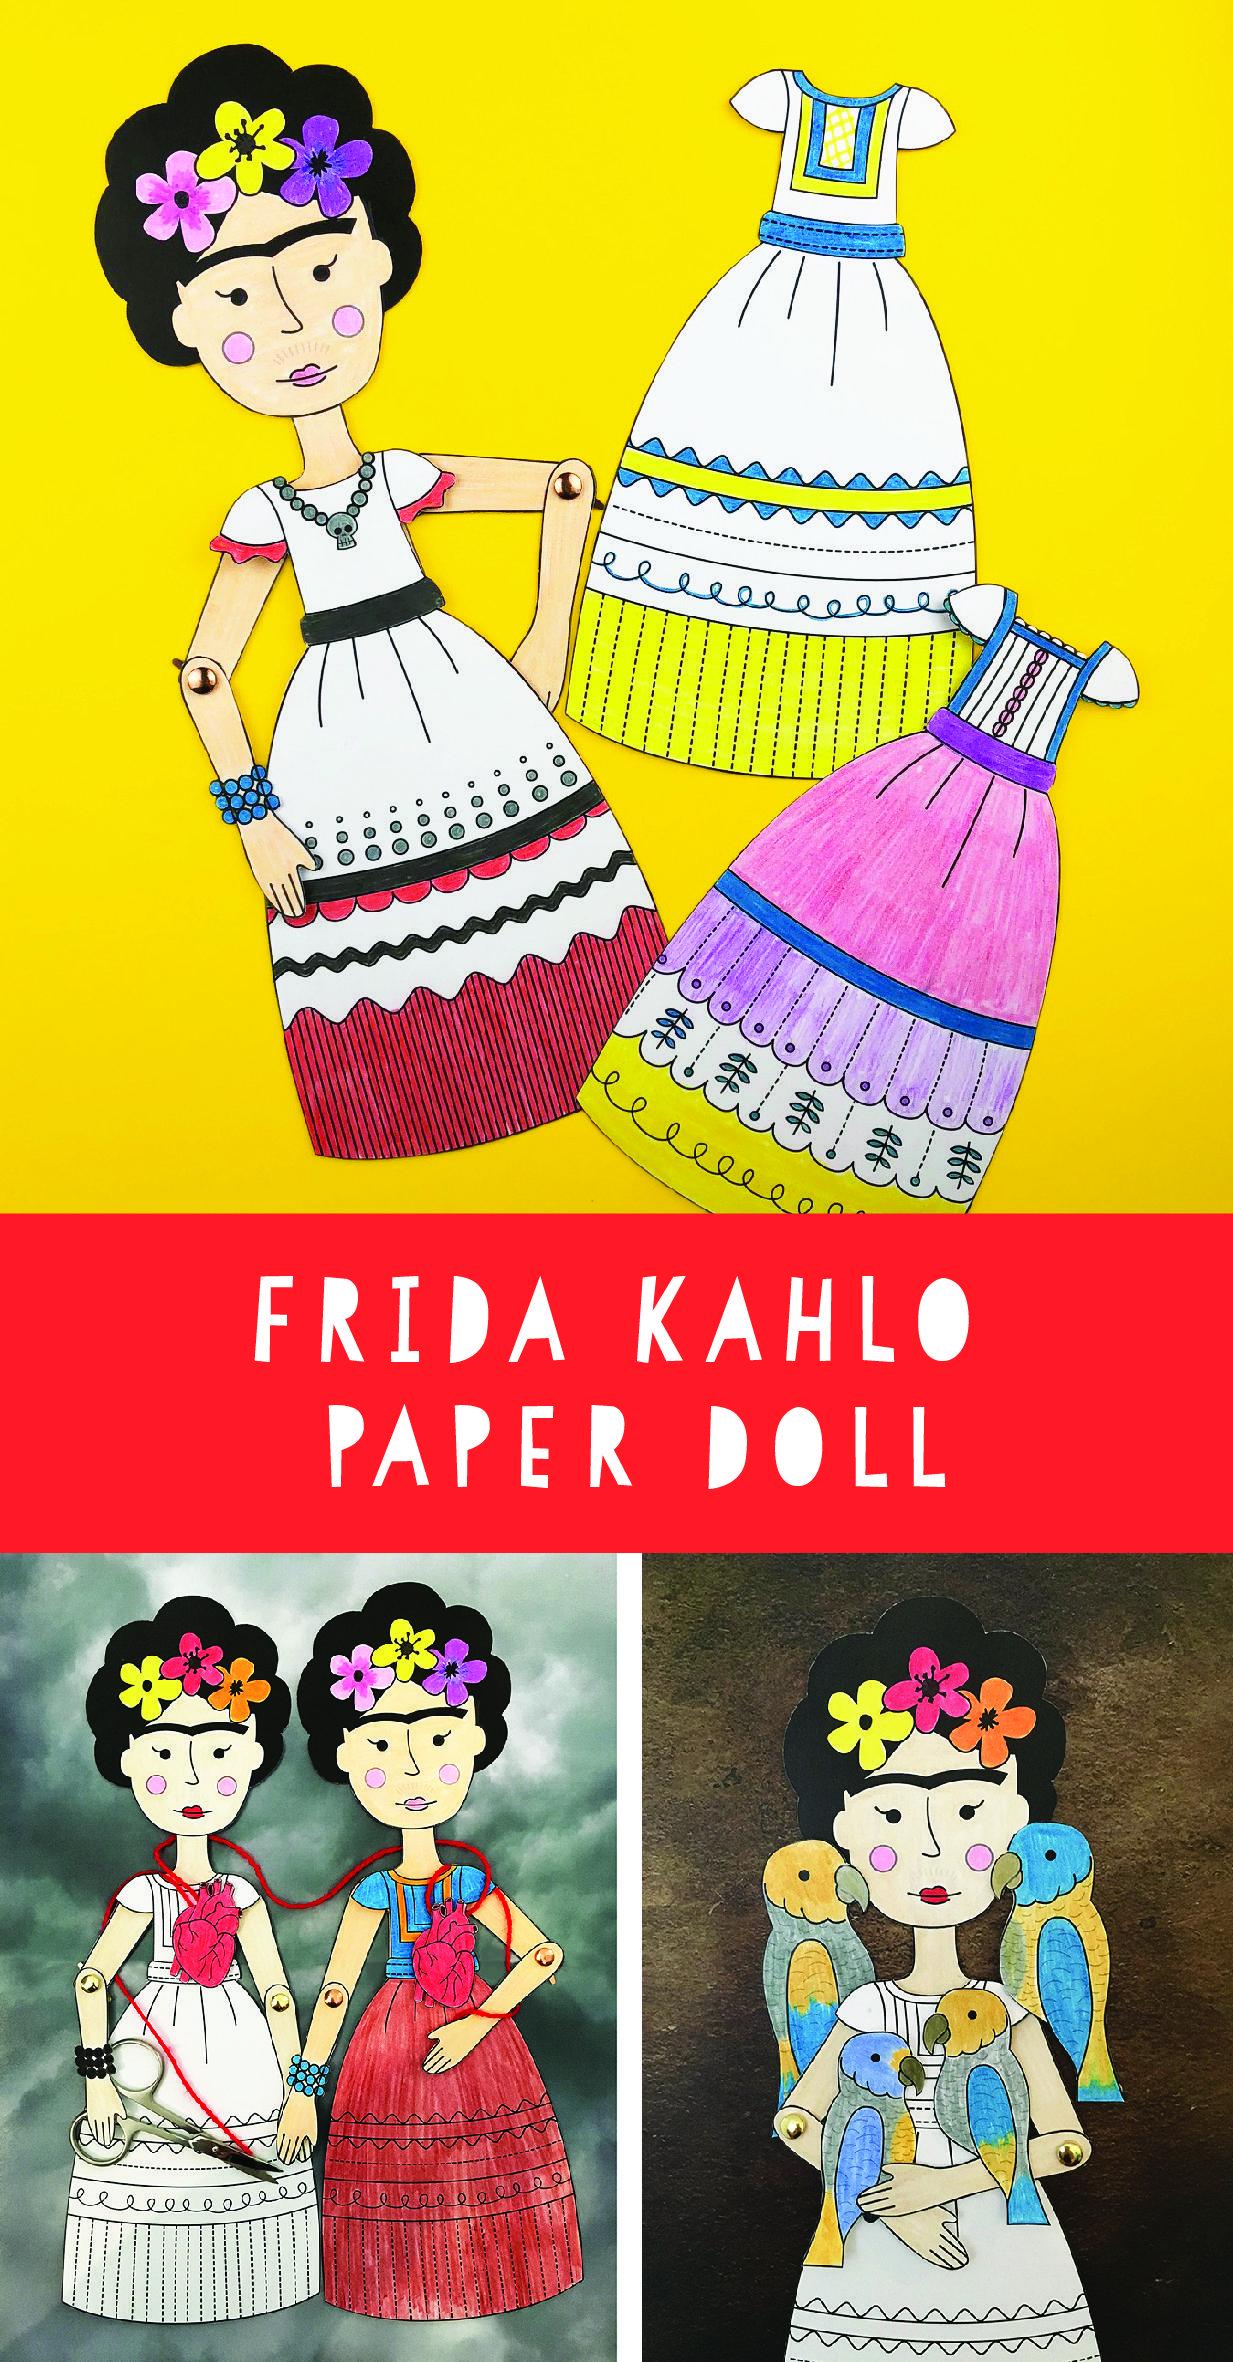 Frida Kahlo Printable Paper Doll Fun Art History Activity